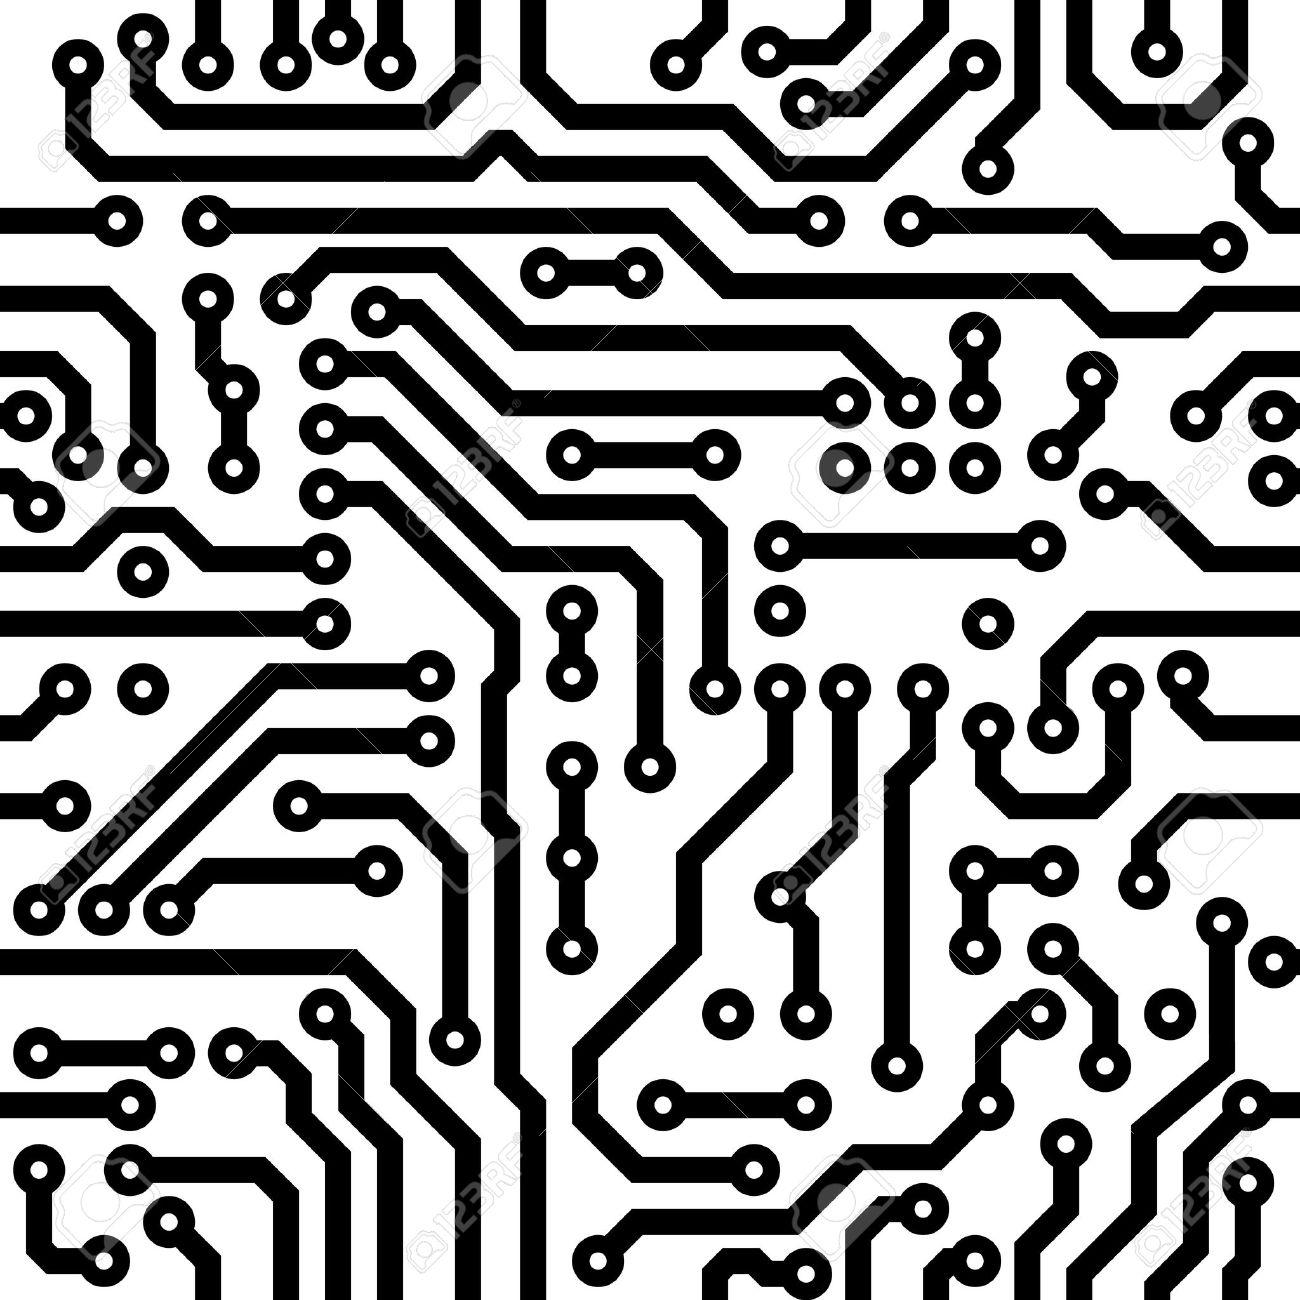 Monochrome Seamless Vector Texture - Electronic Circuit Board ...